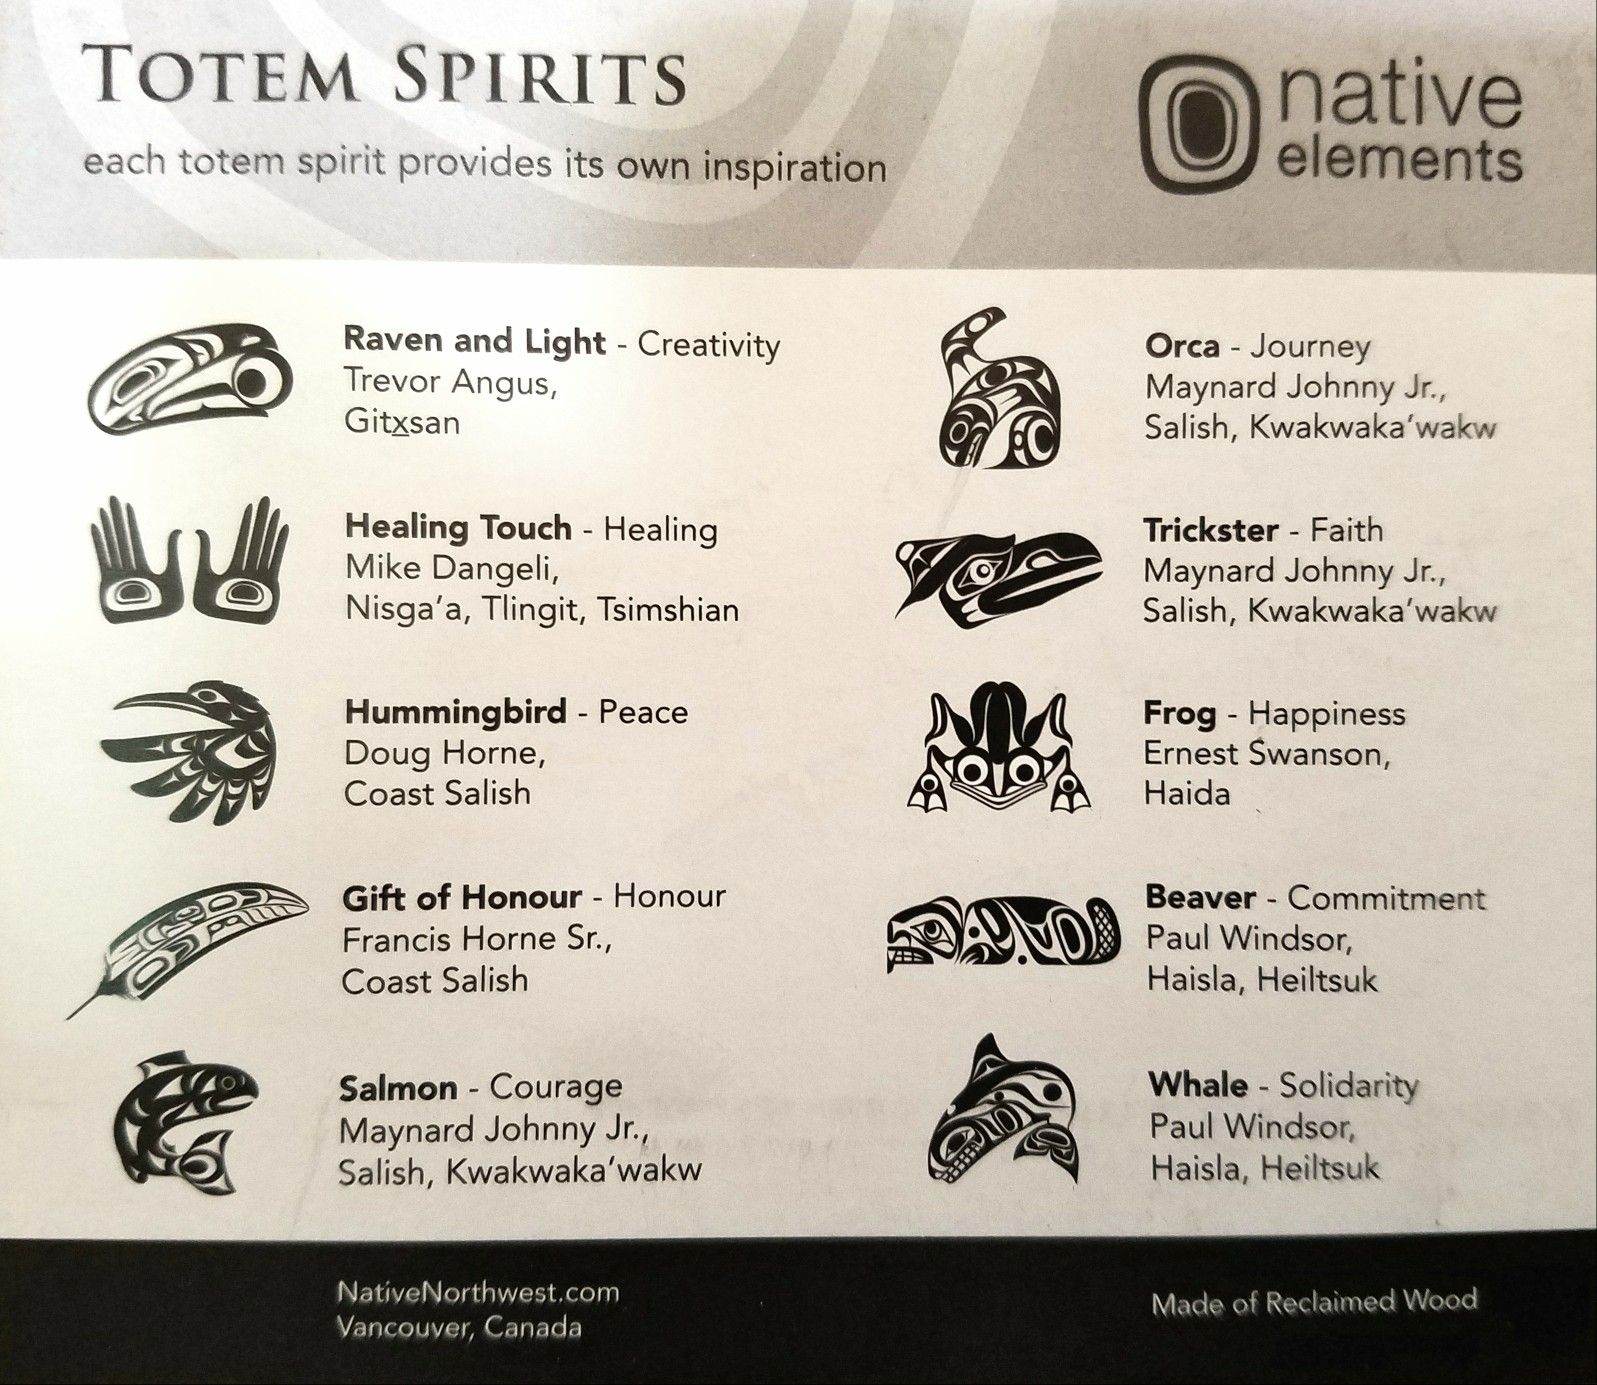 Totem spirits tribal art tattoo animal symbols and meanings totem spirits tribal art tattoo animal symbols and meanings first nation designs native buycottarizona